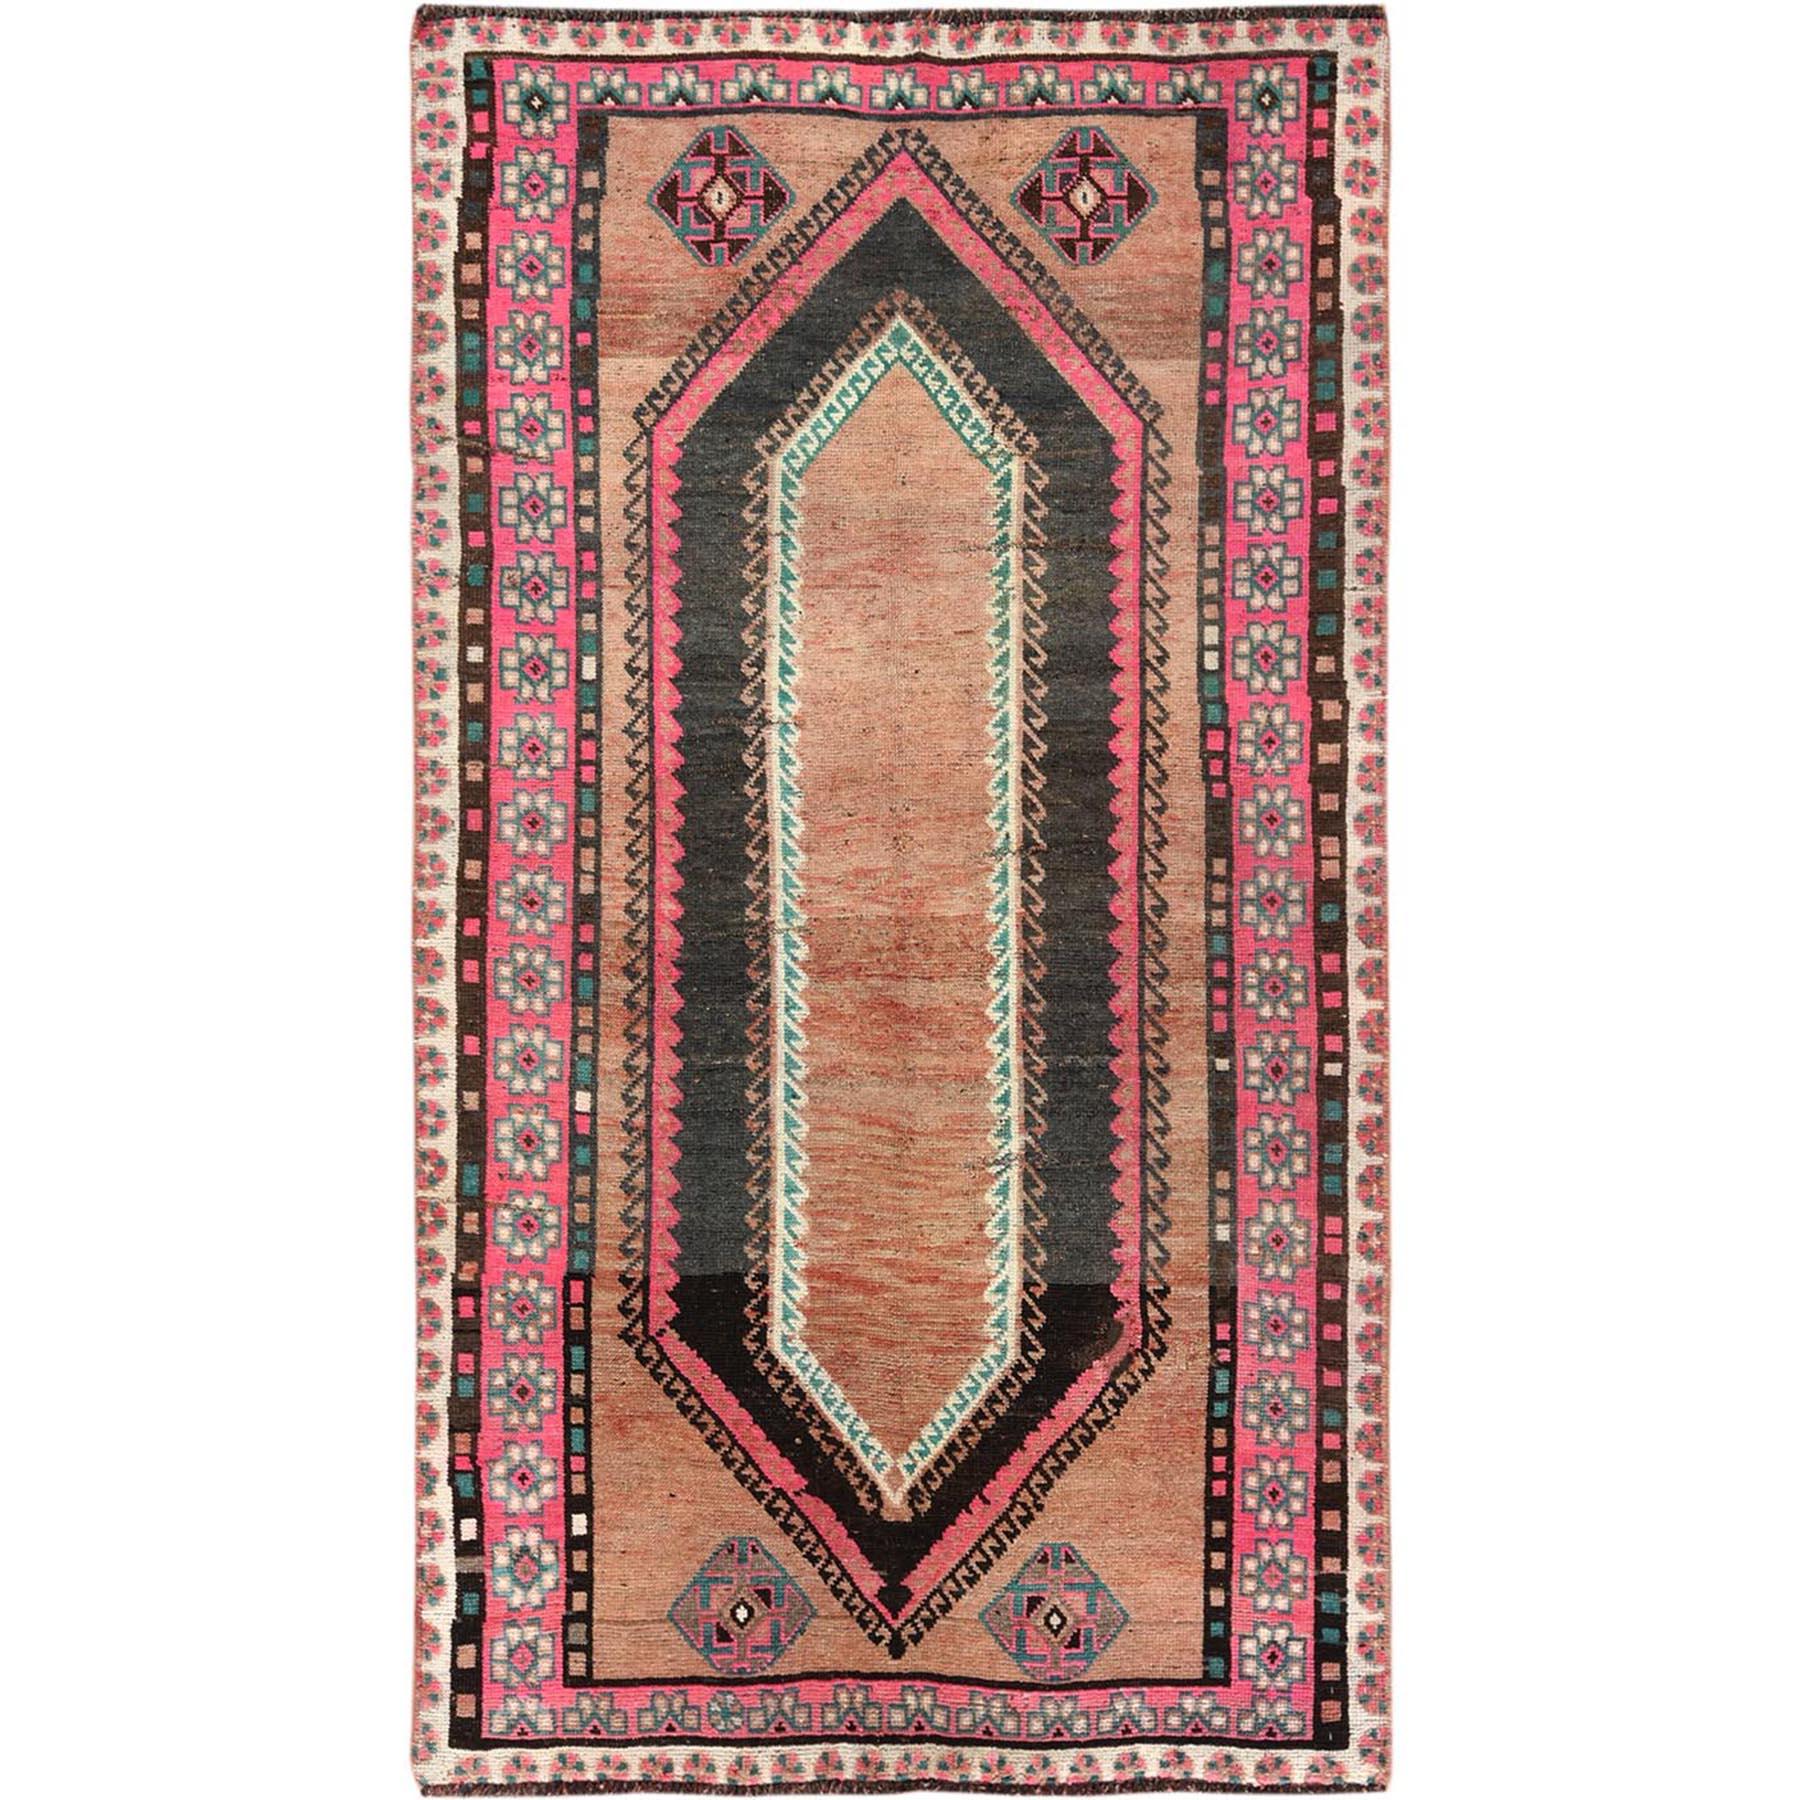 "4'7""x8'6"" Pure Wool Honey Brown Persian Qashqai Hand Knotted Vintage Worn Down Clean Geometric Pattern Oriental Rug"